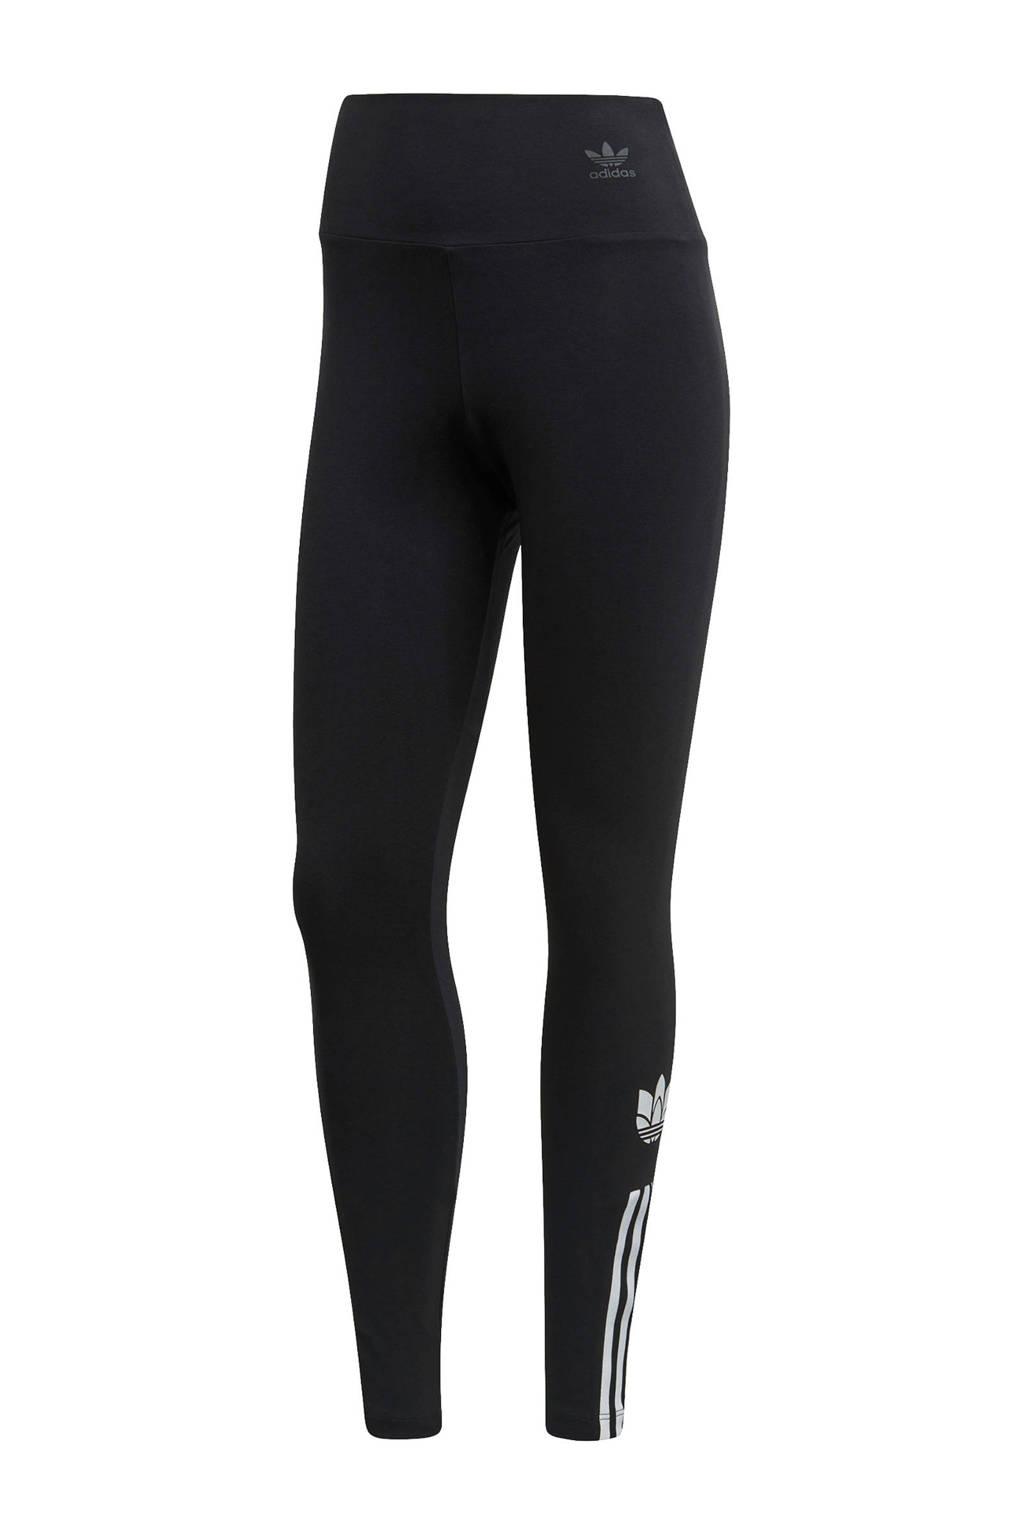 adidas Originals legging zwart, Zwart